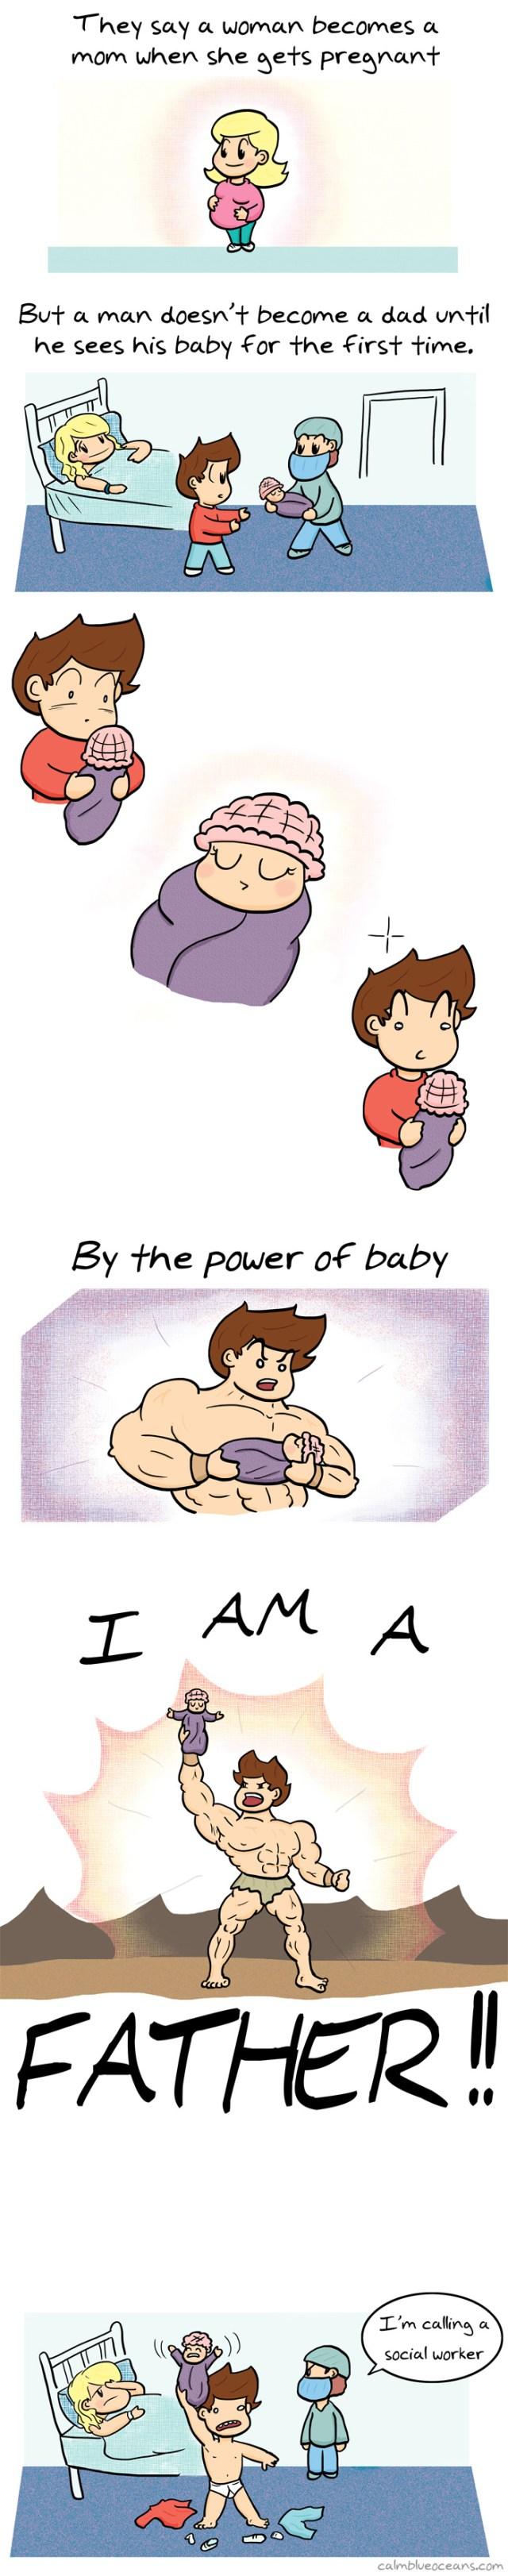 I AM A FATHER.jpg